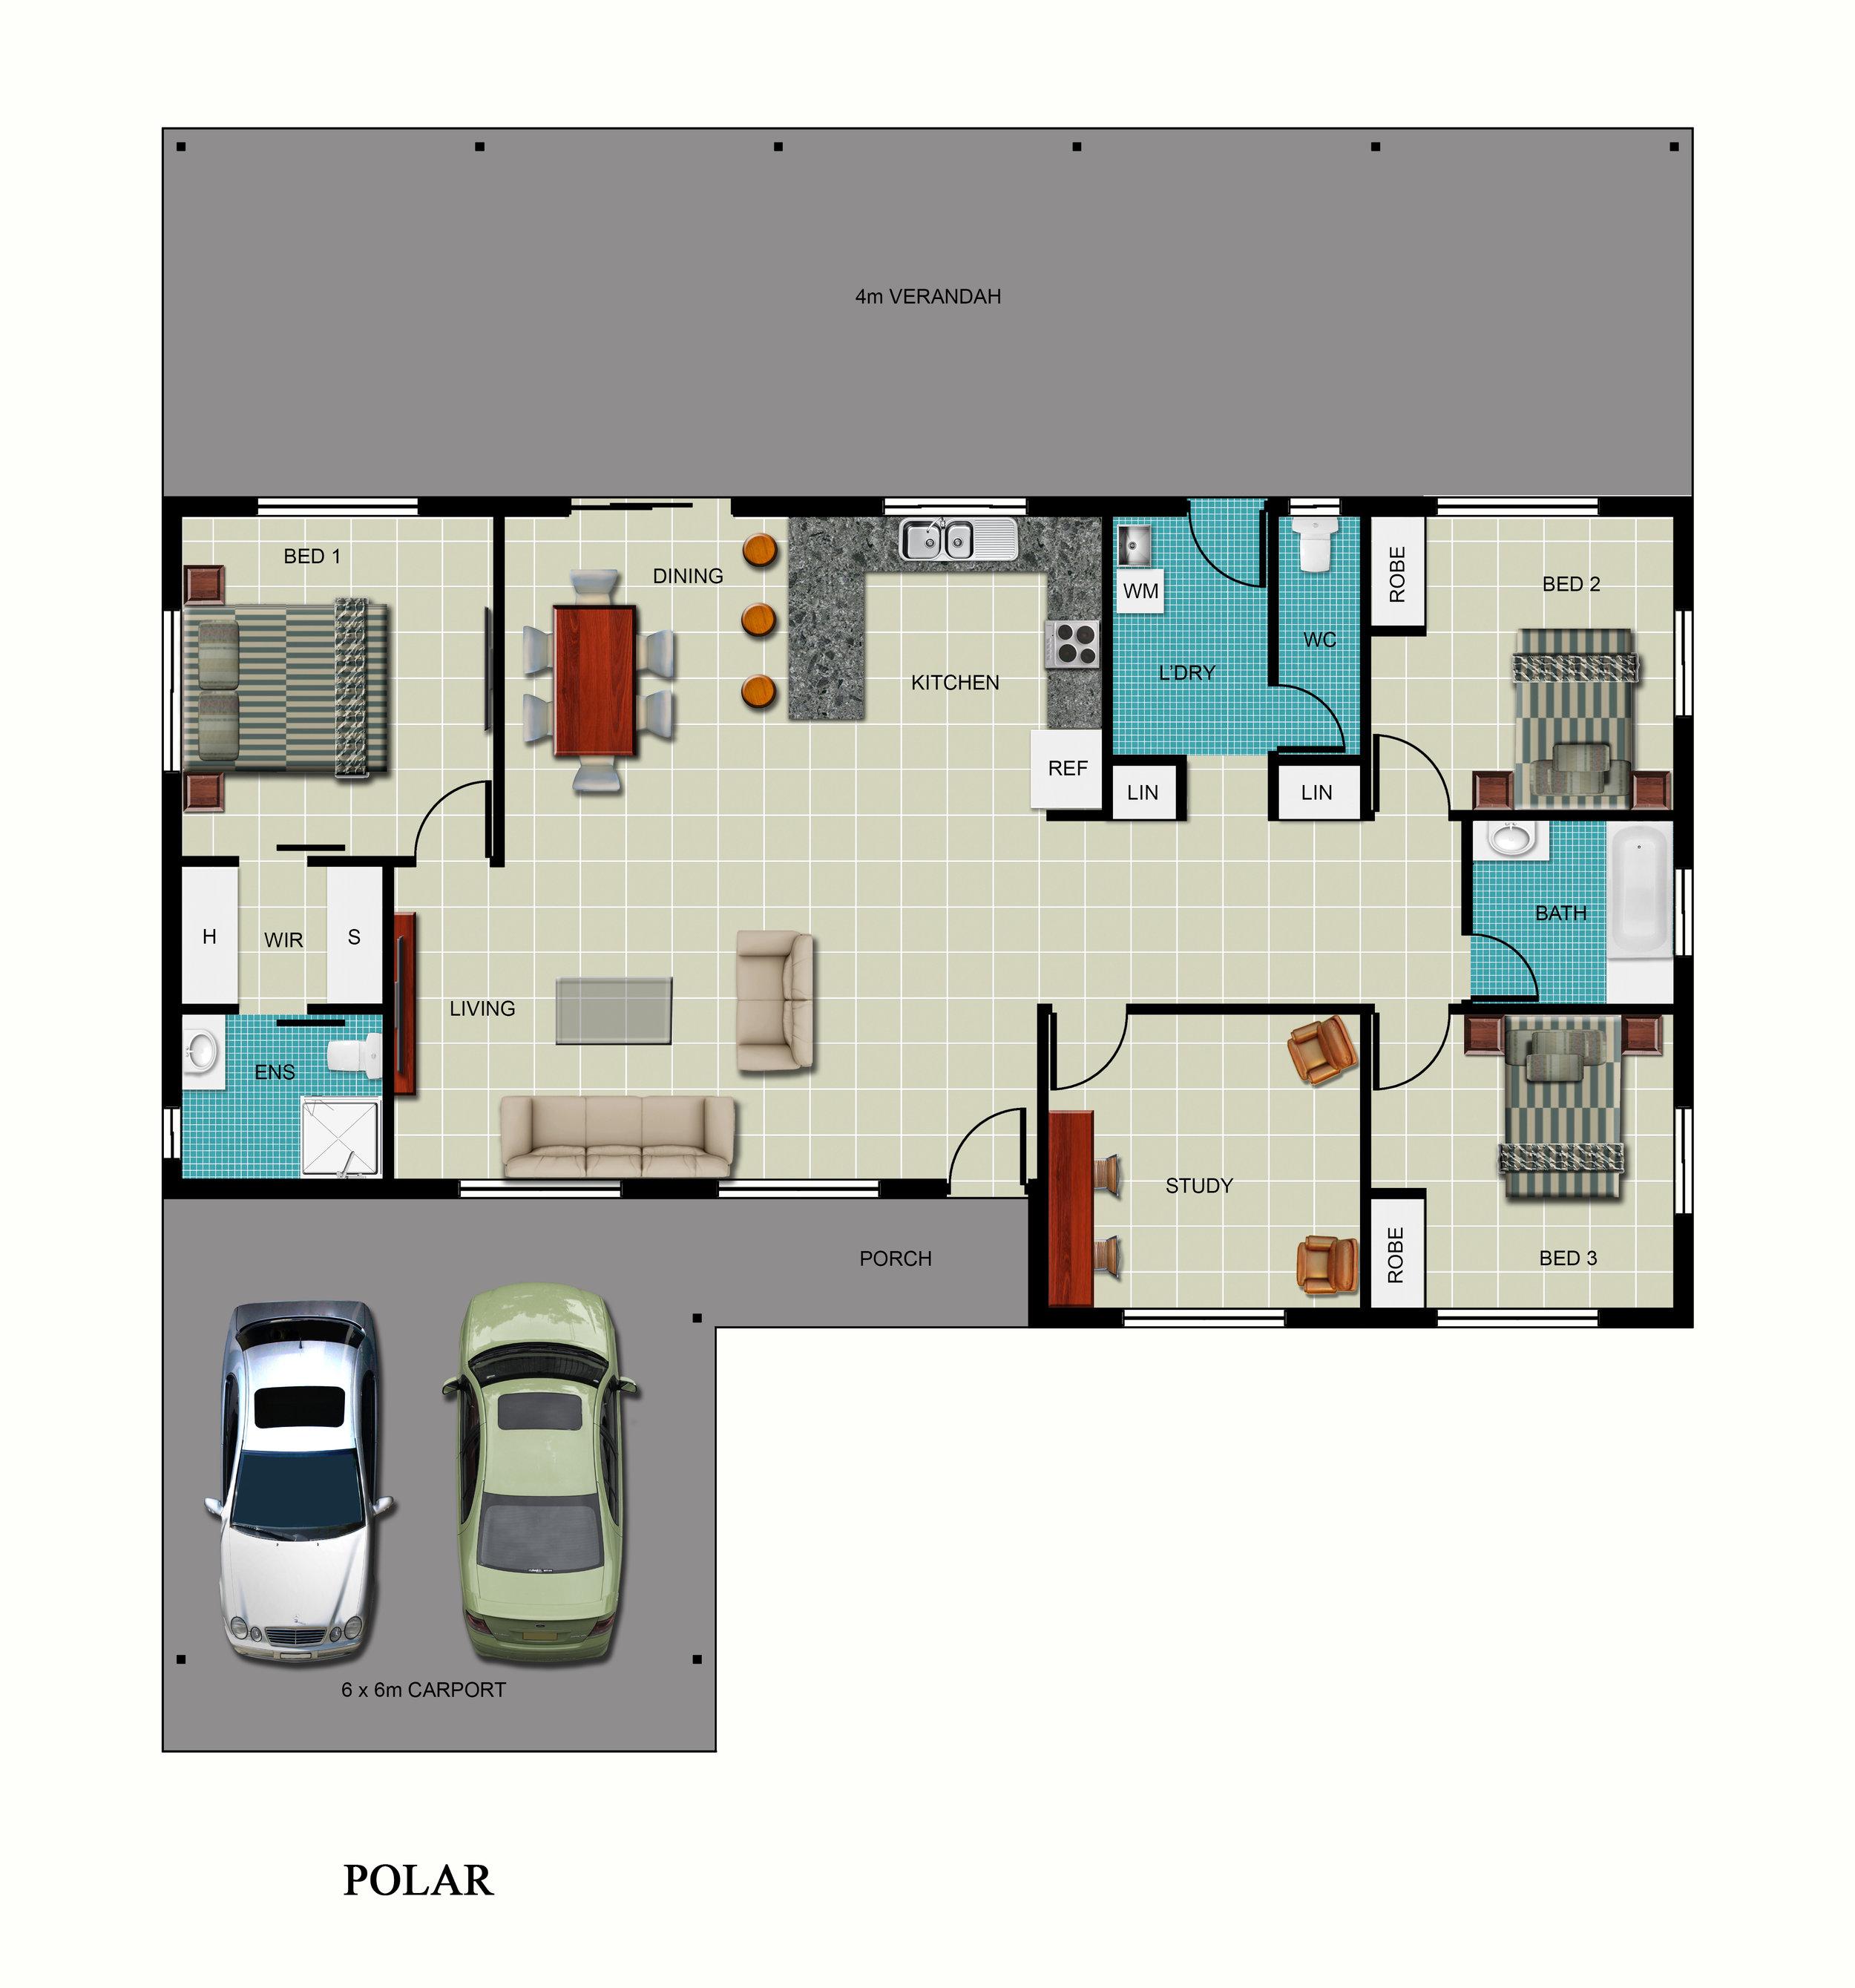 Polar Floor Plan